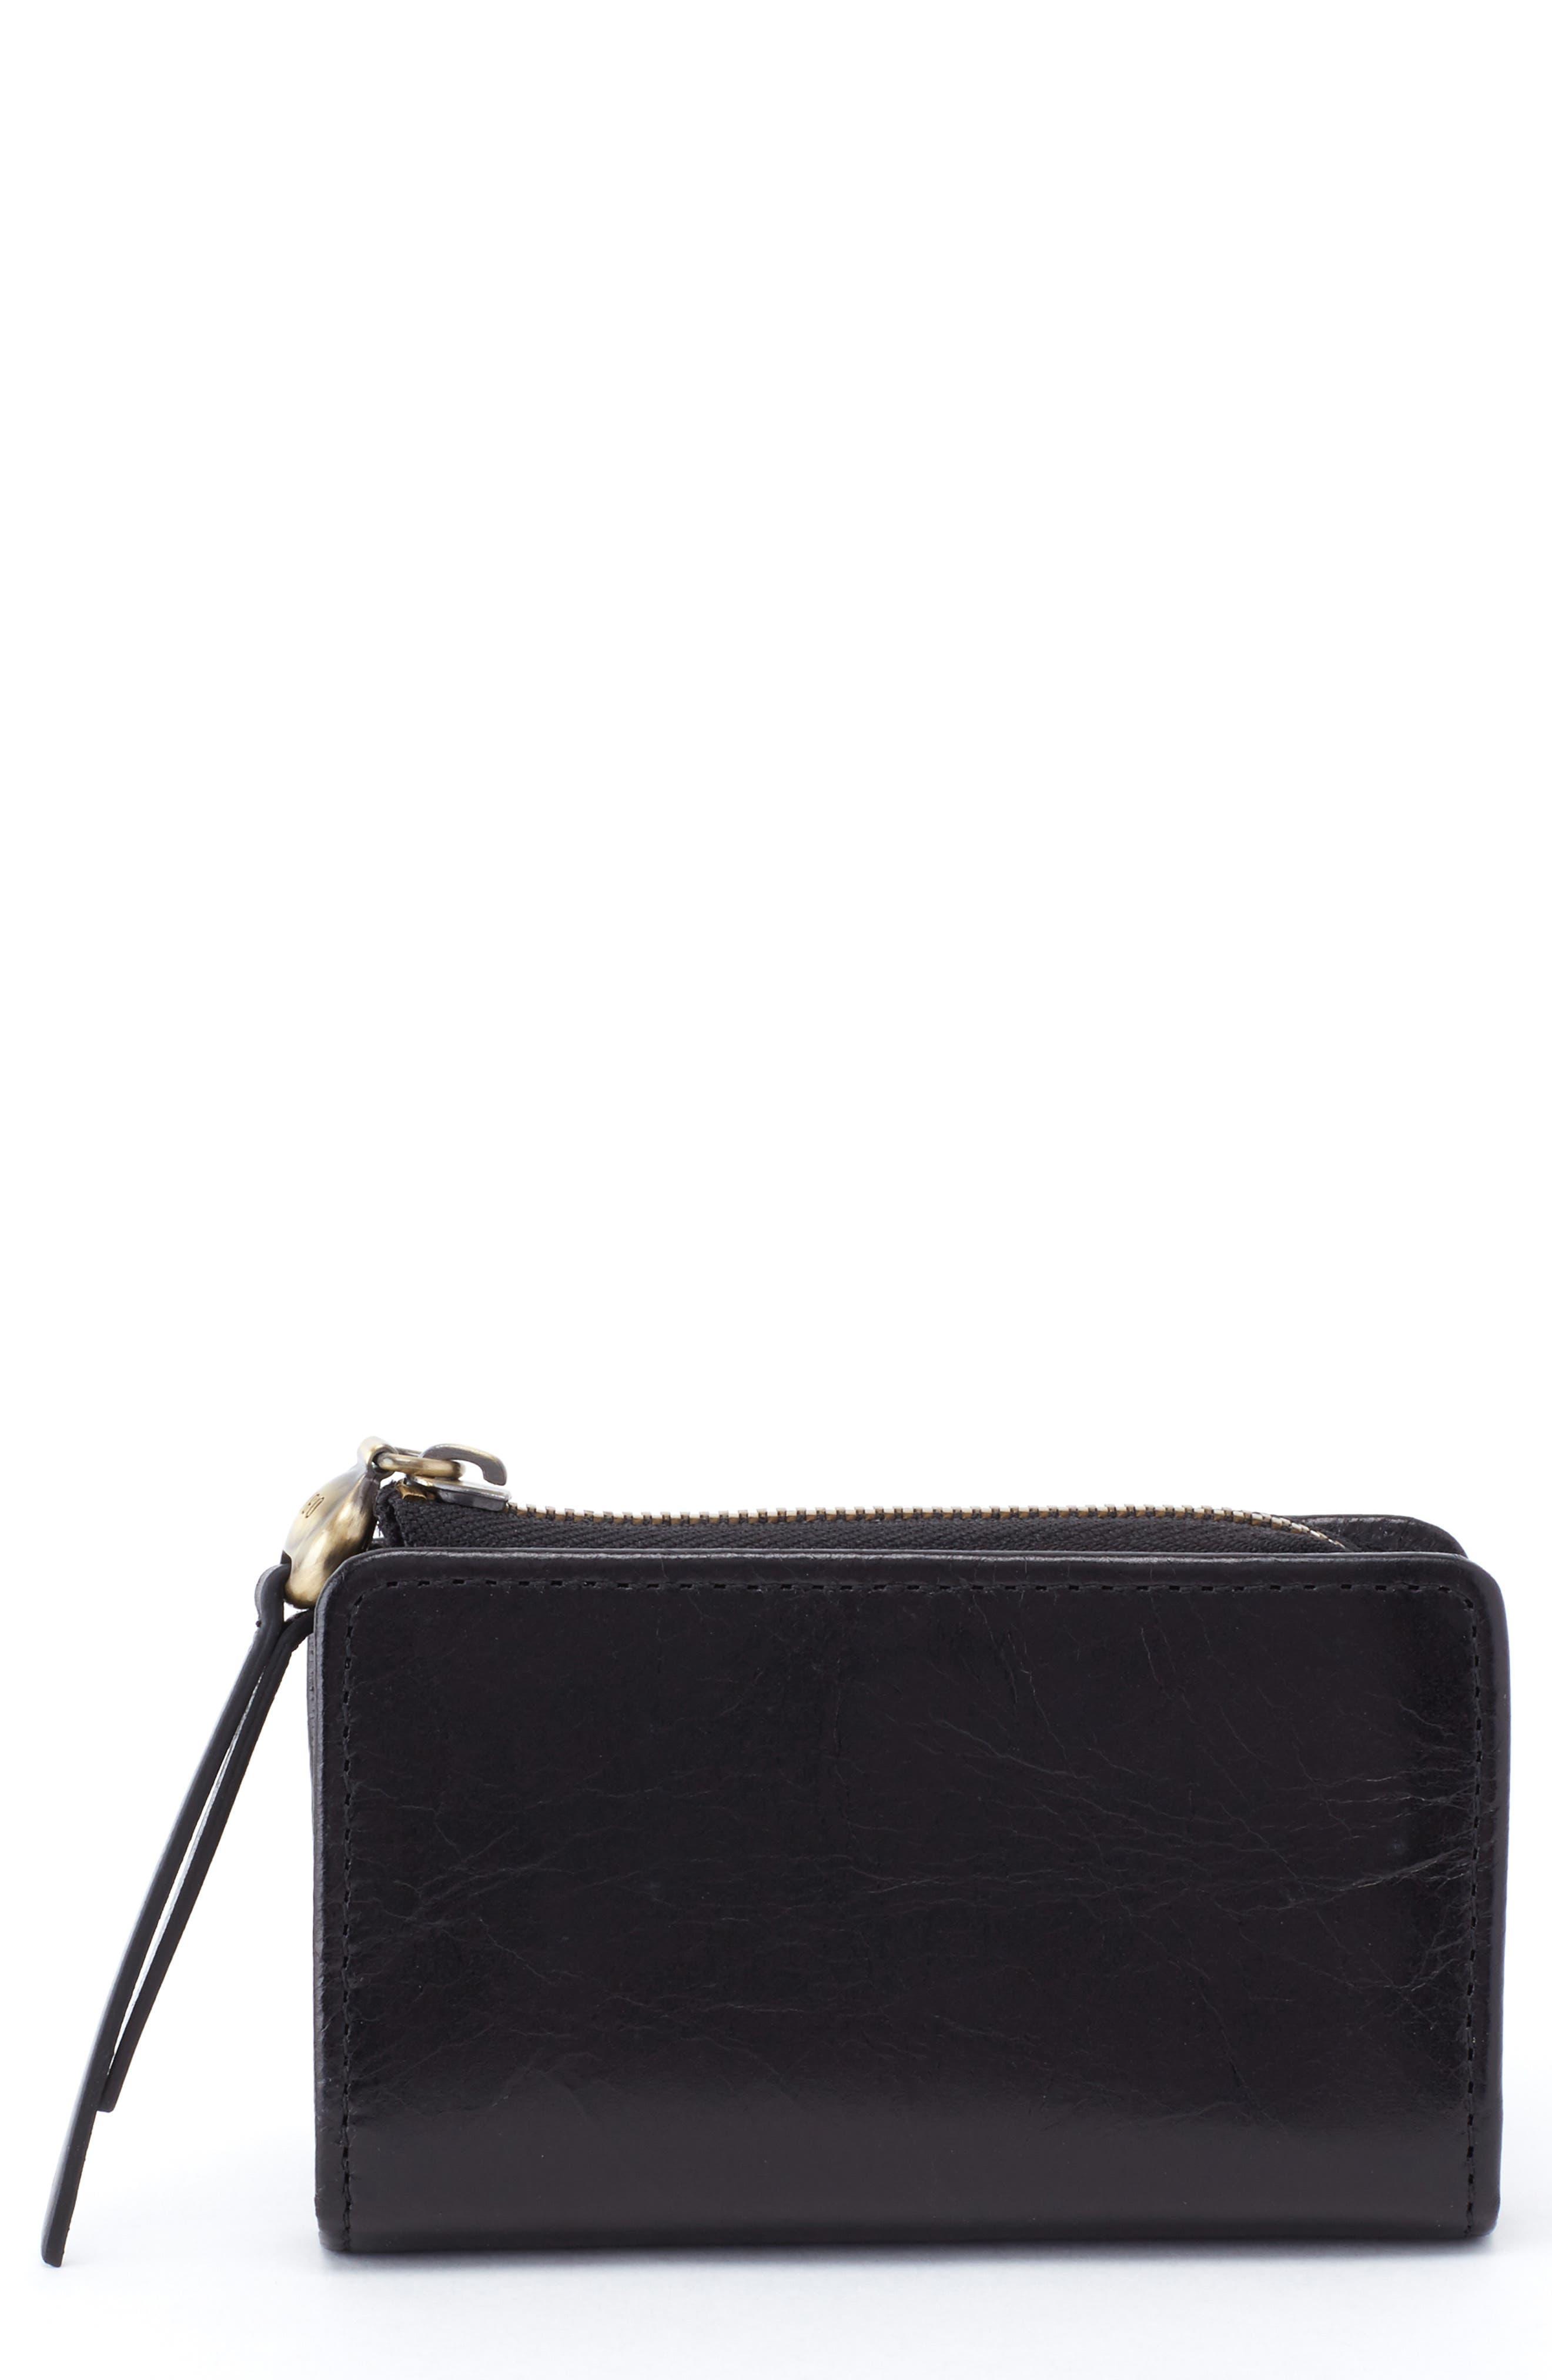 HOBO, Dart Calfskin Leather Wallet, Main thumbnail 1, color, BLACK